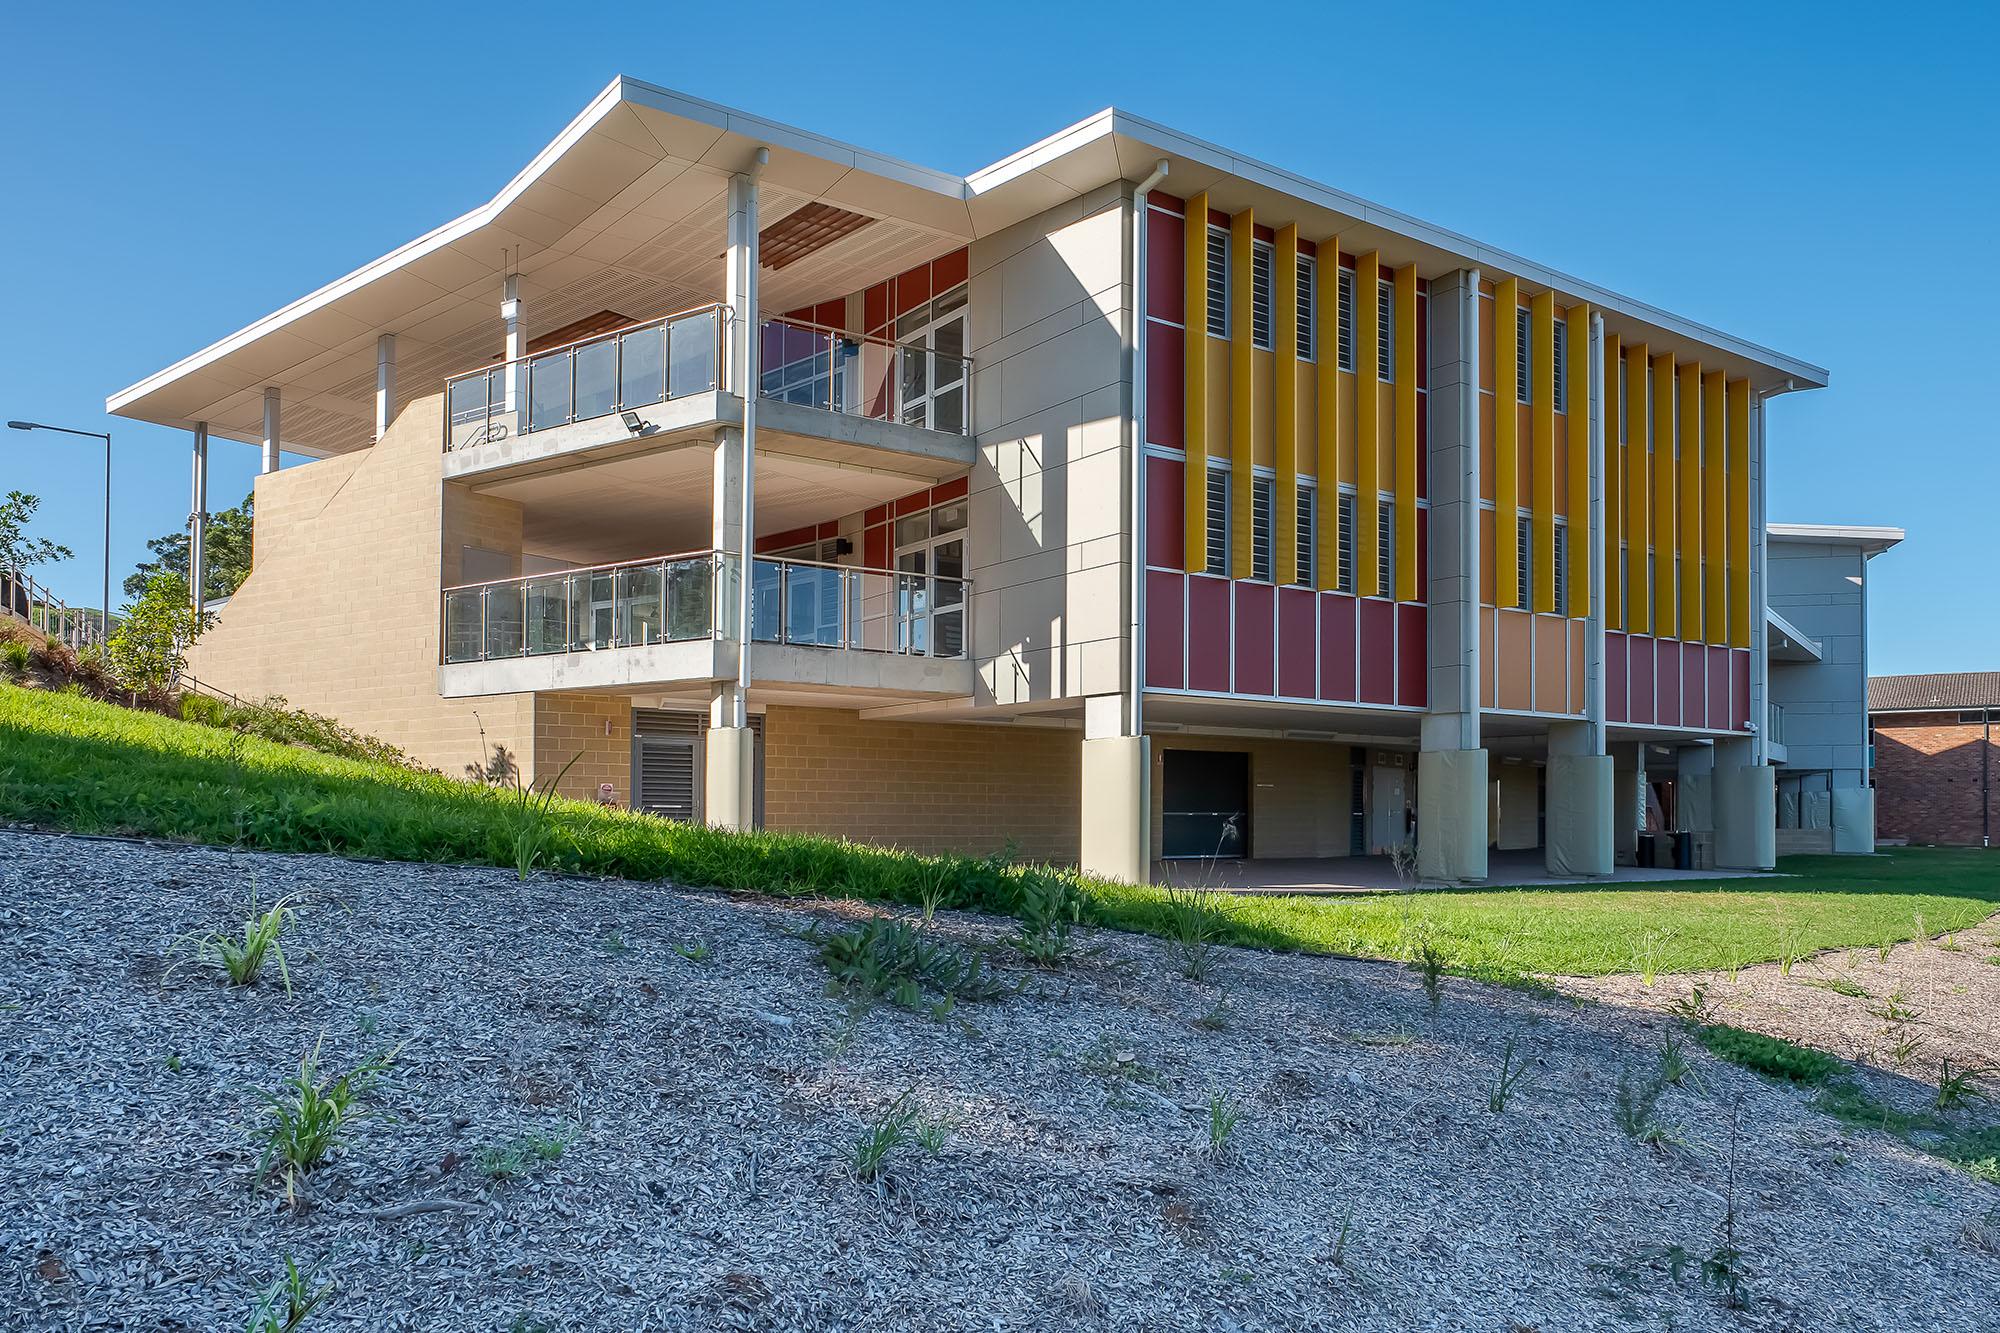 Excelsior Public School Architecture Exterior – Gardner Wetherill GW 3